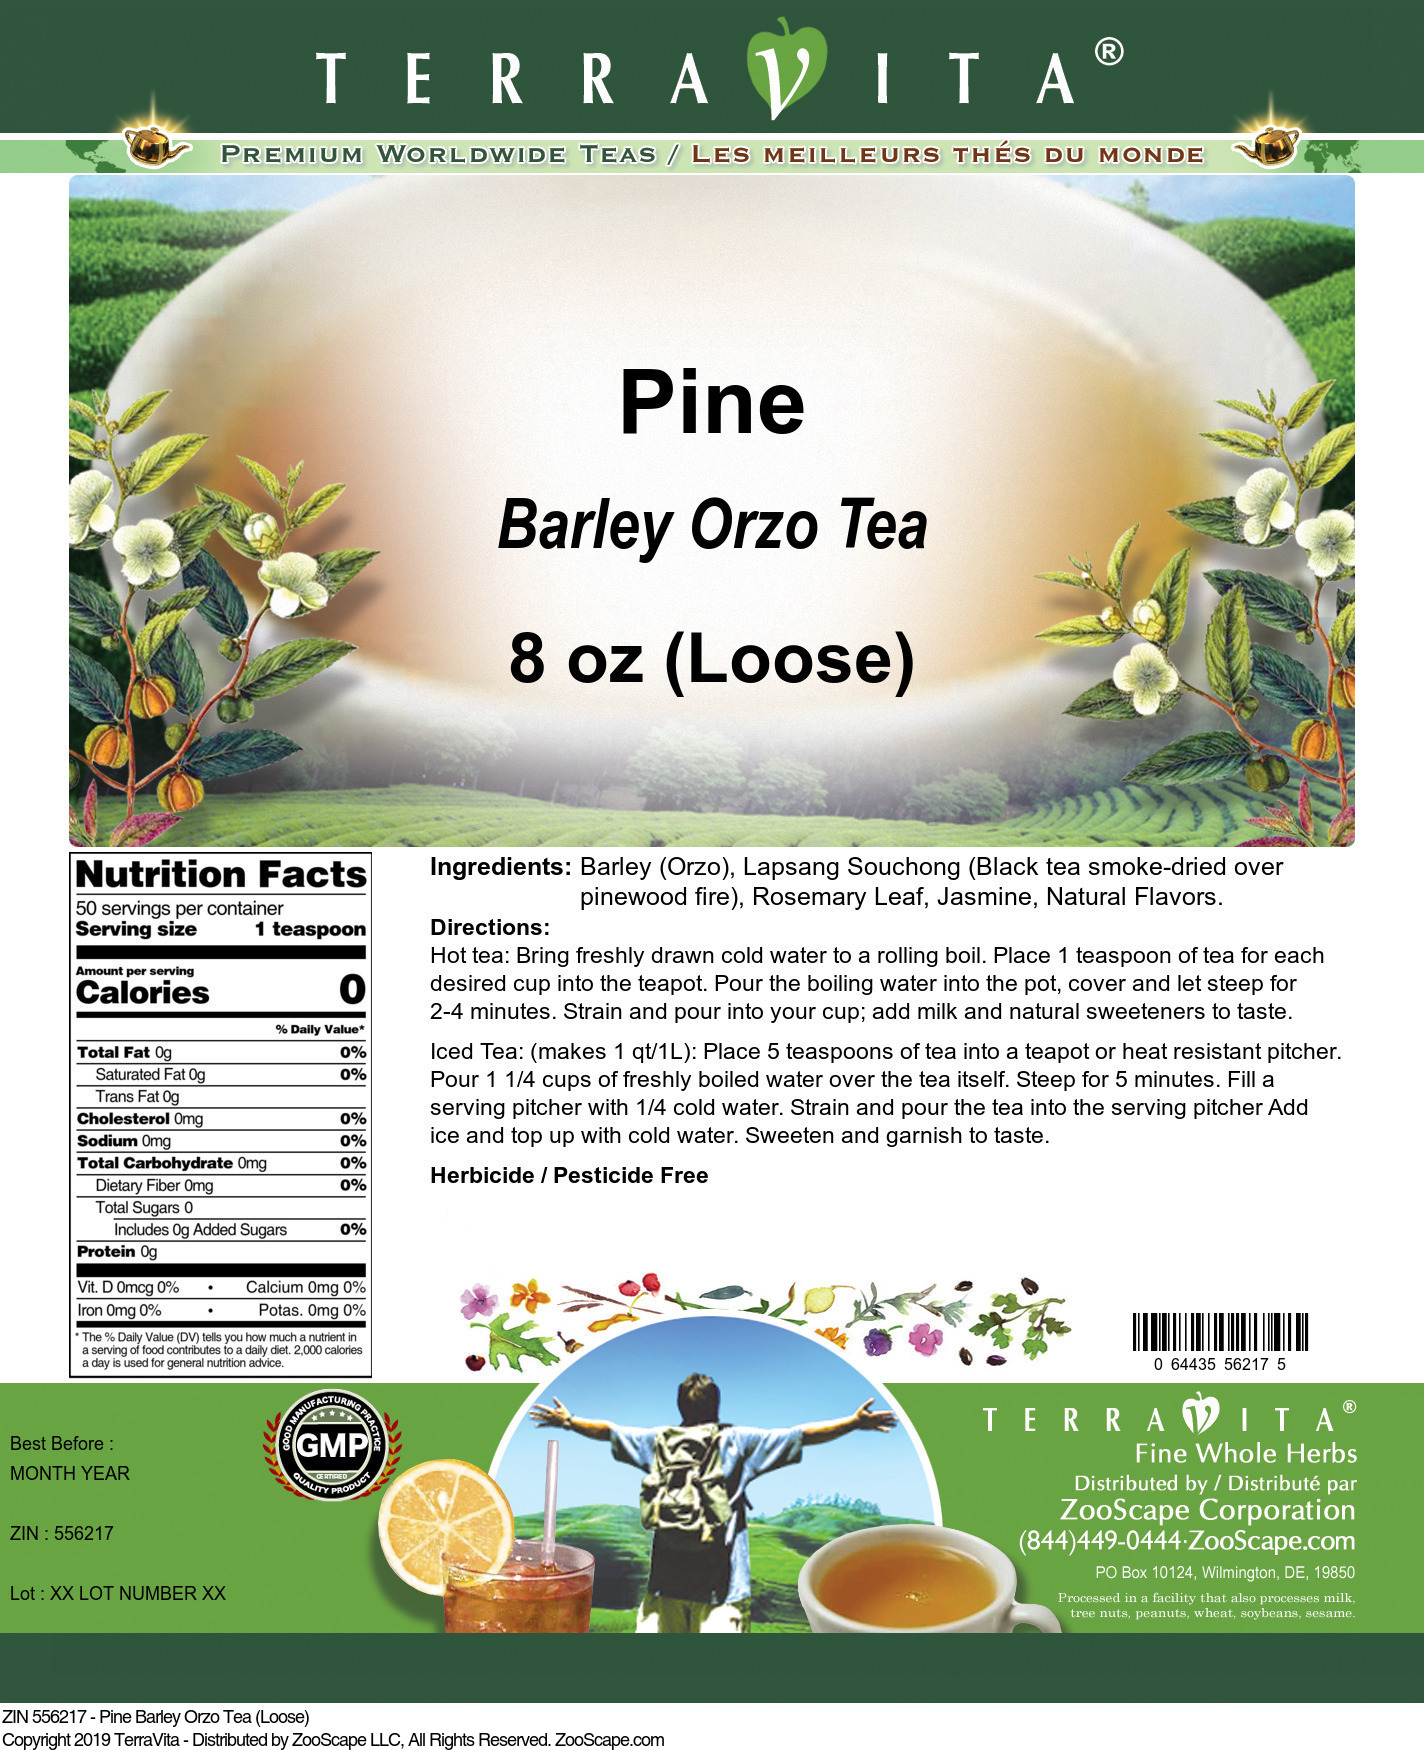 Pine Barley Orzo Tea (Loose)